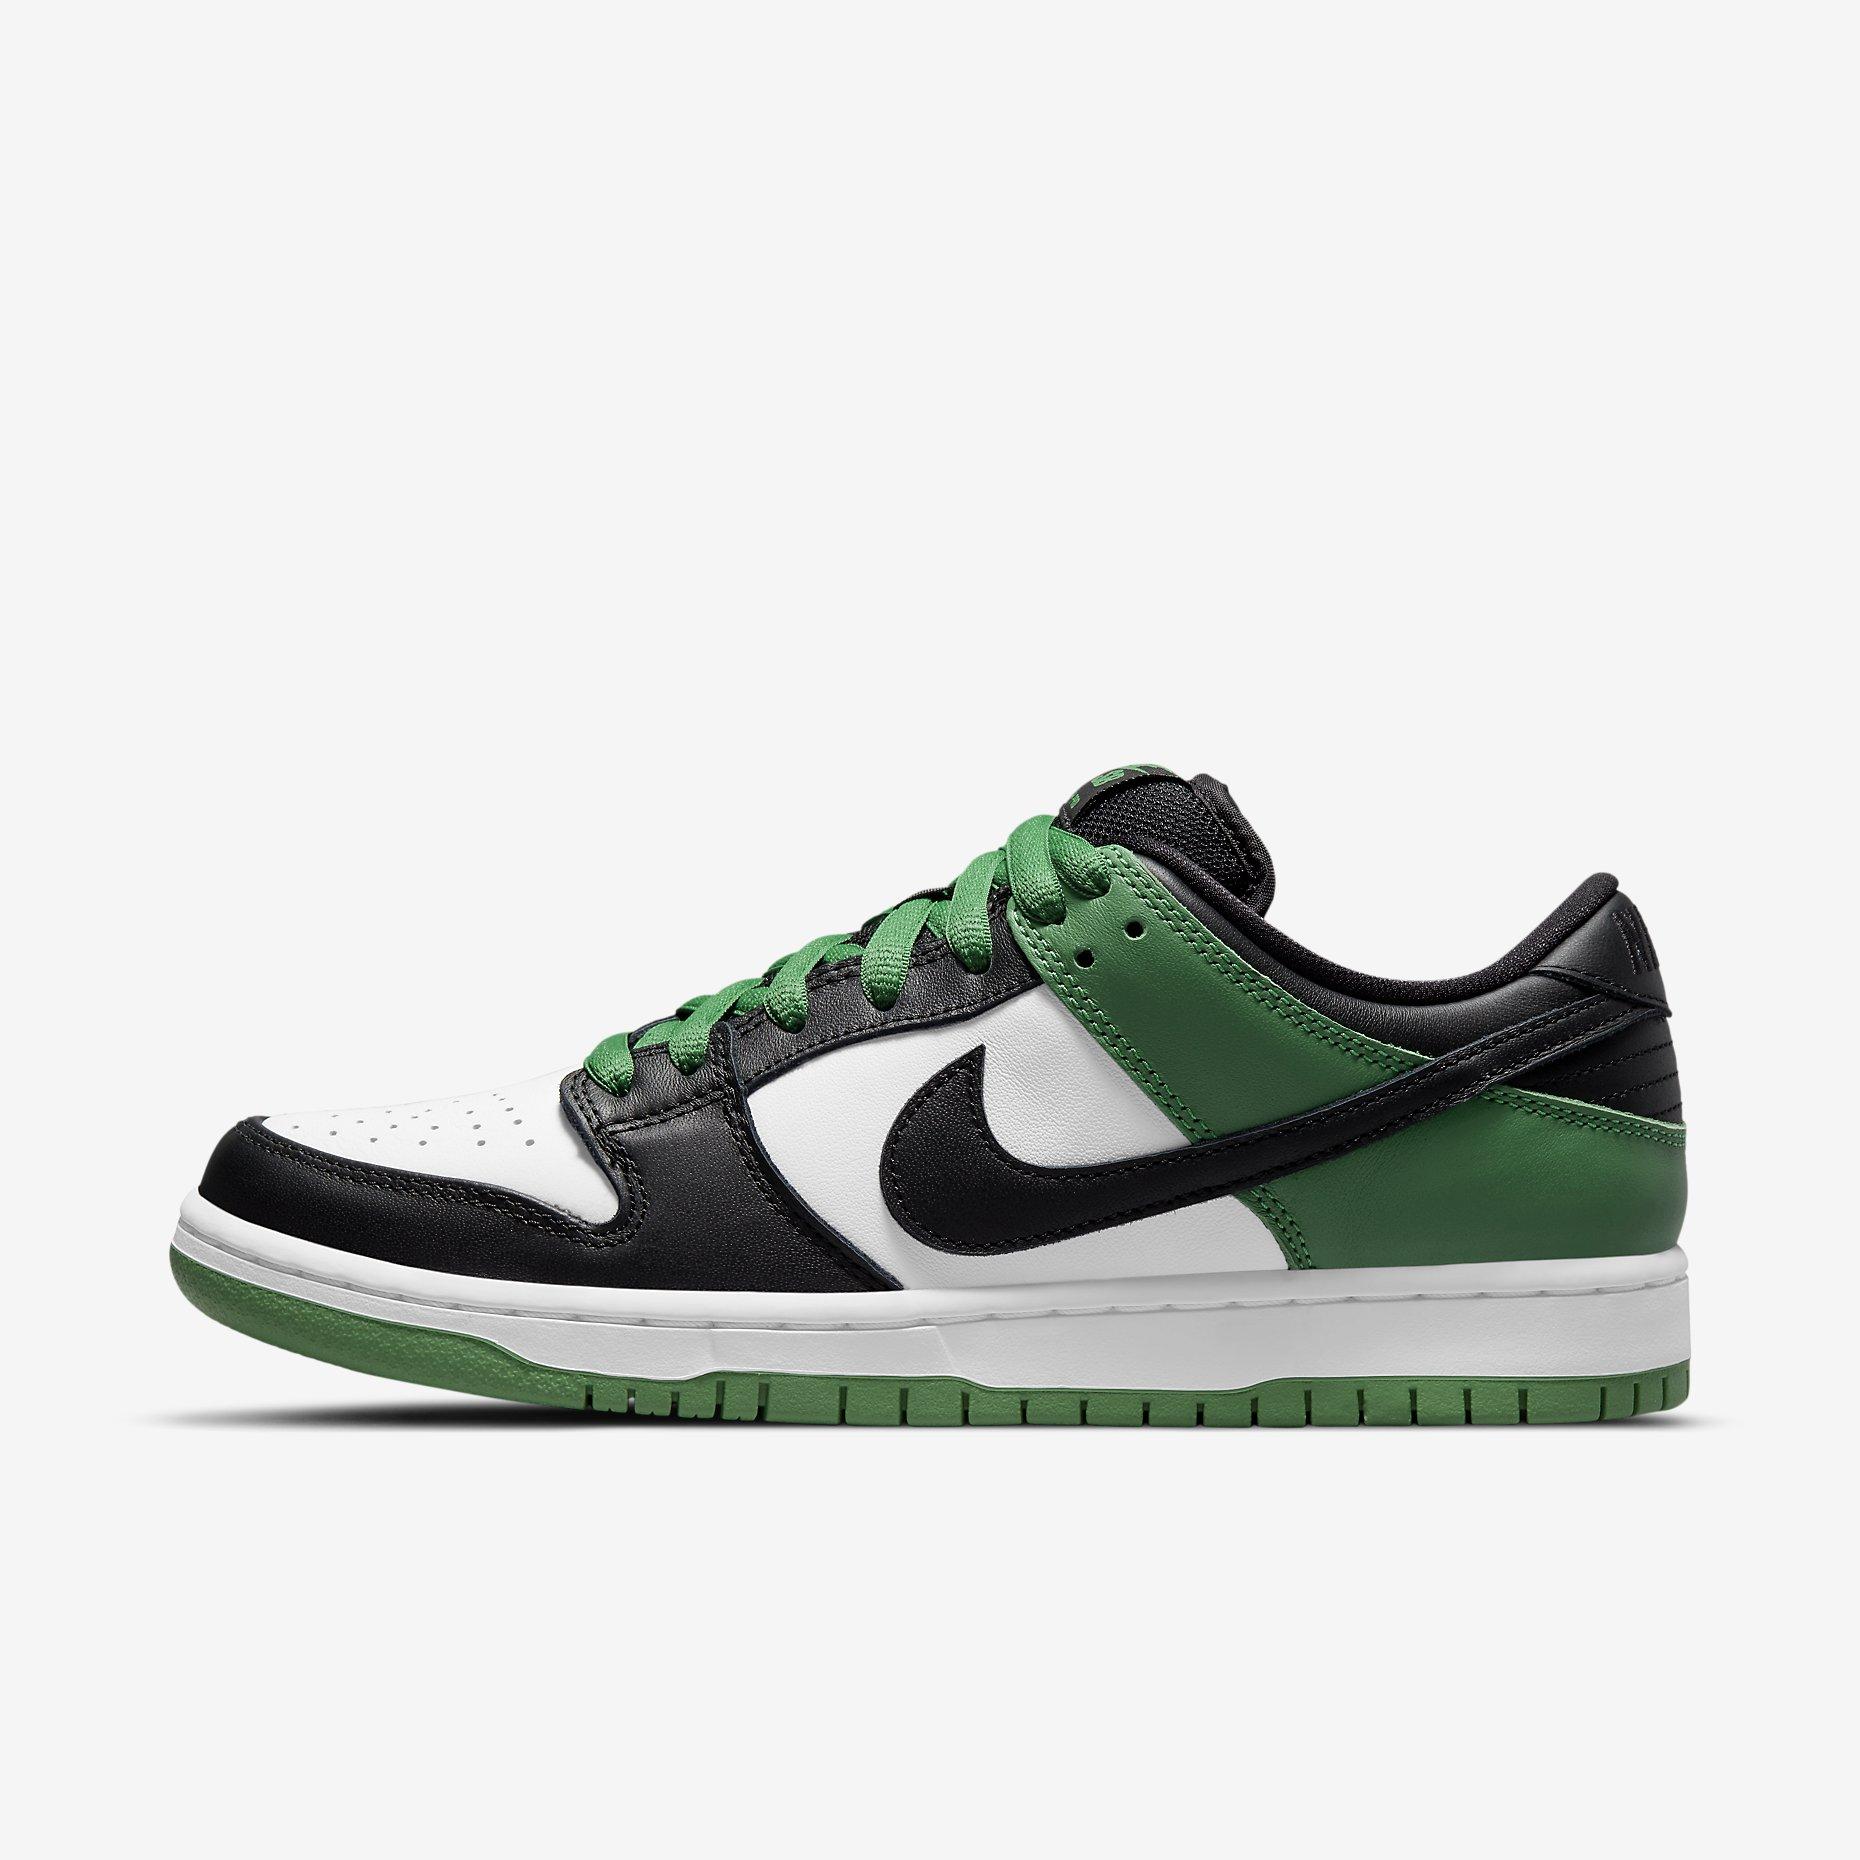 Nike SB Dunk Low Pro 'Classic Green'